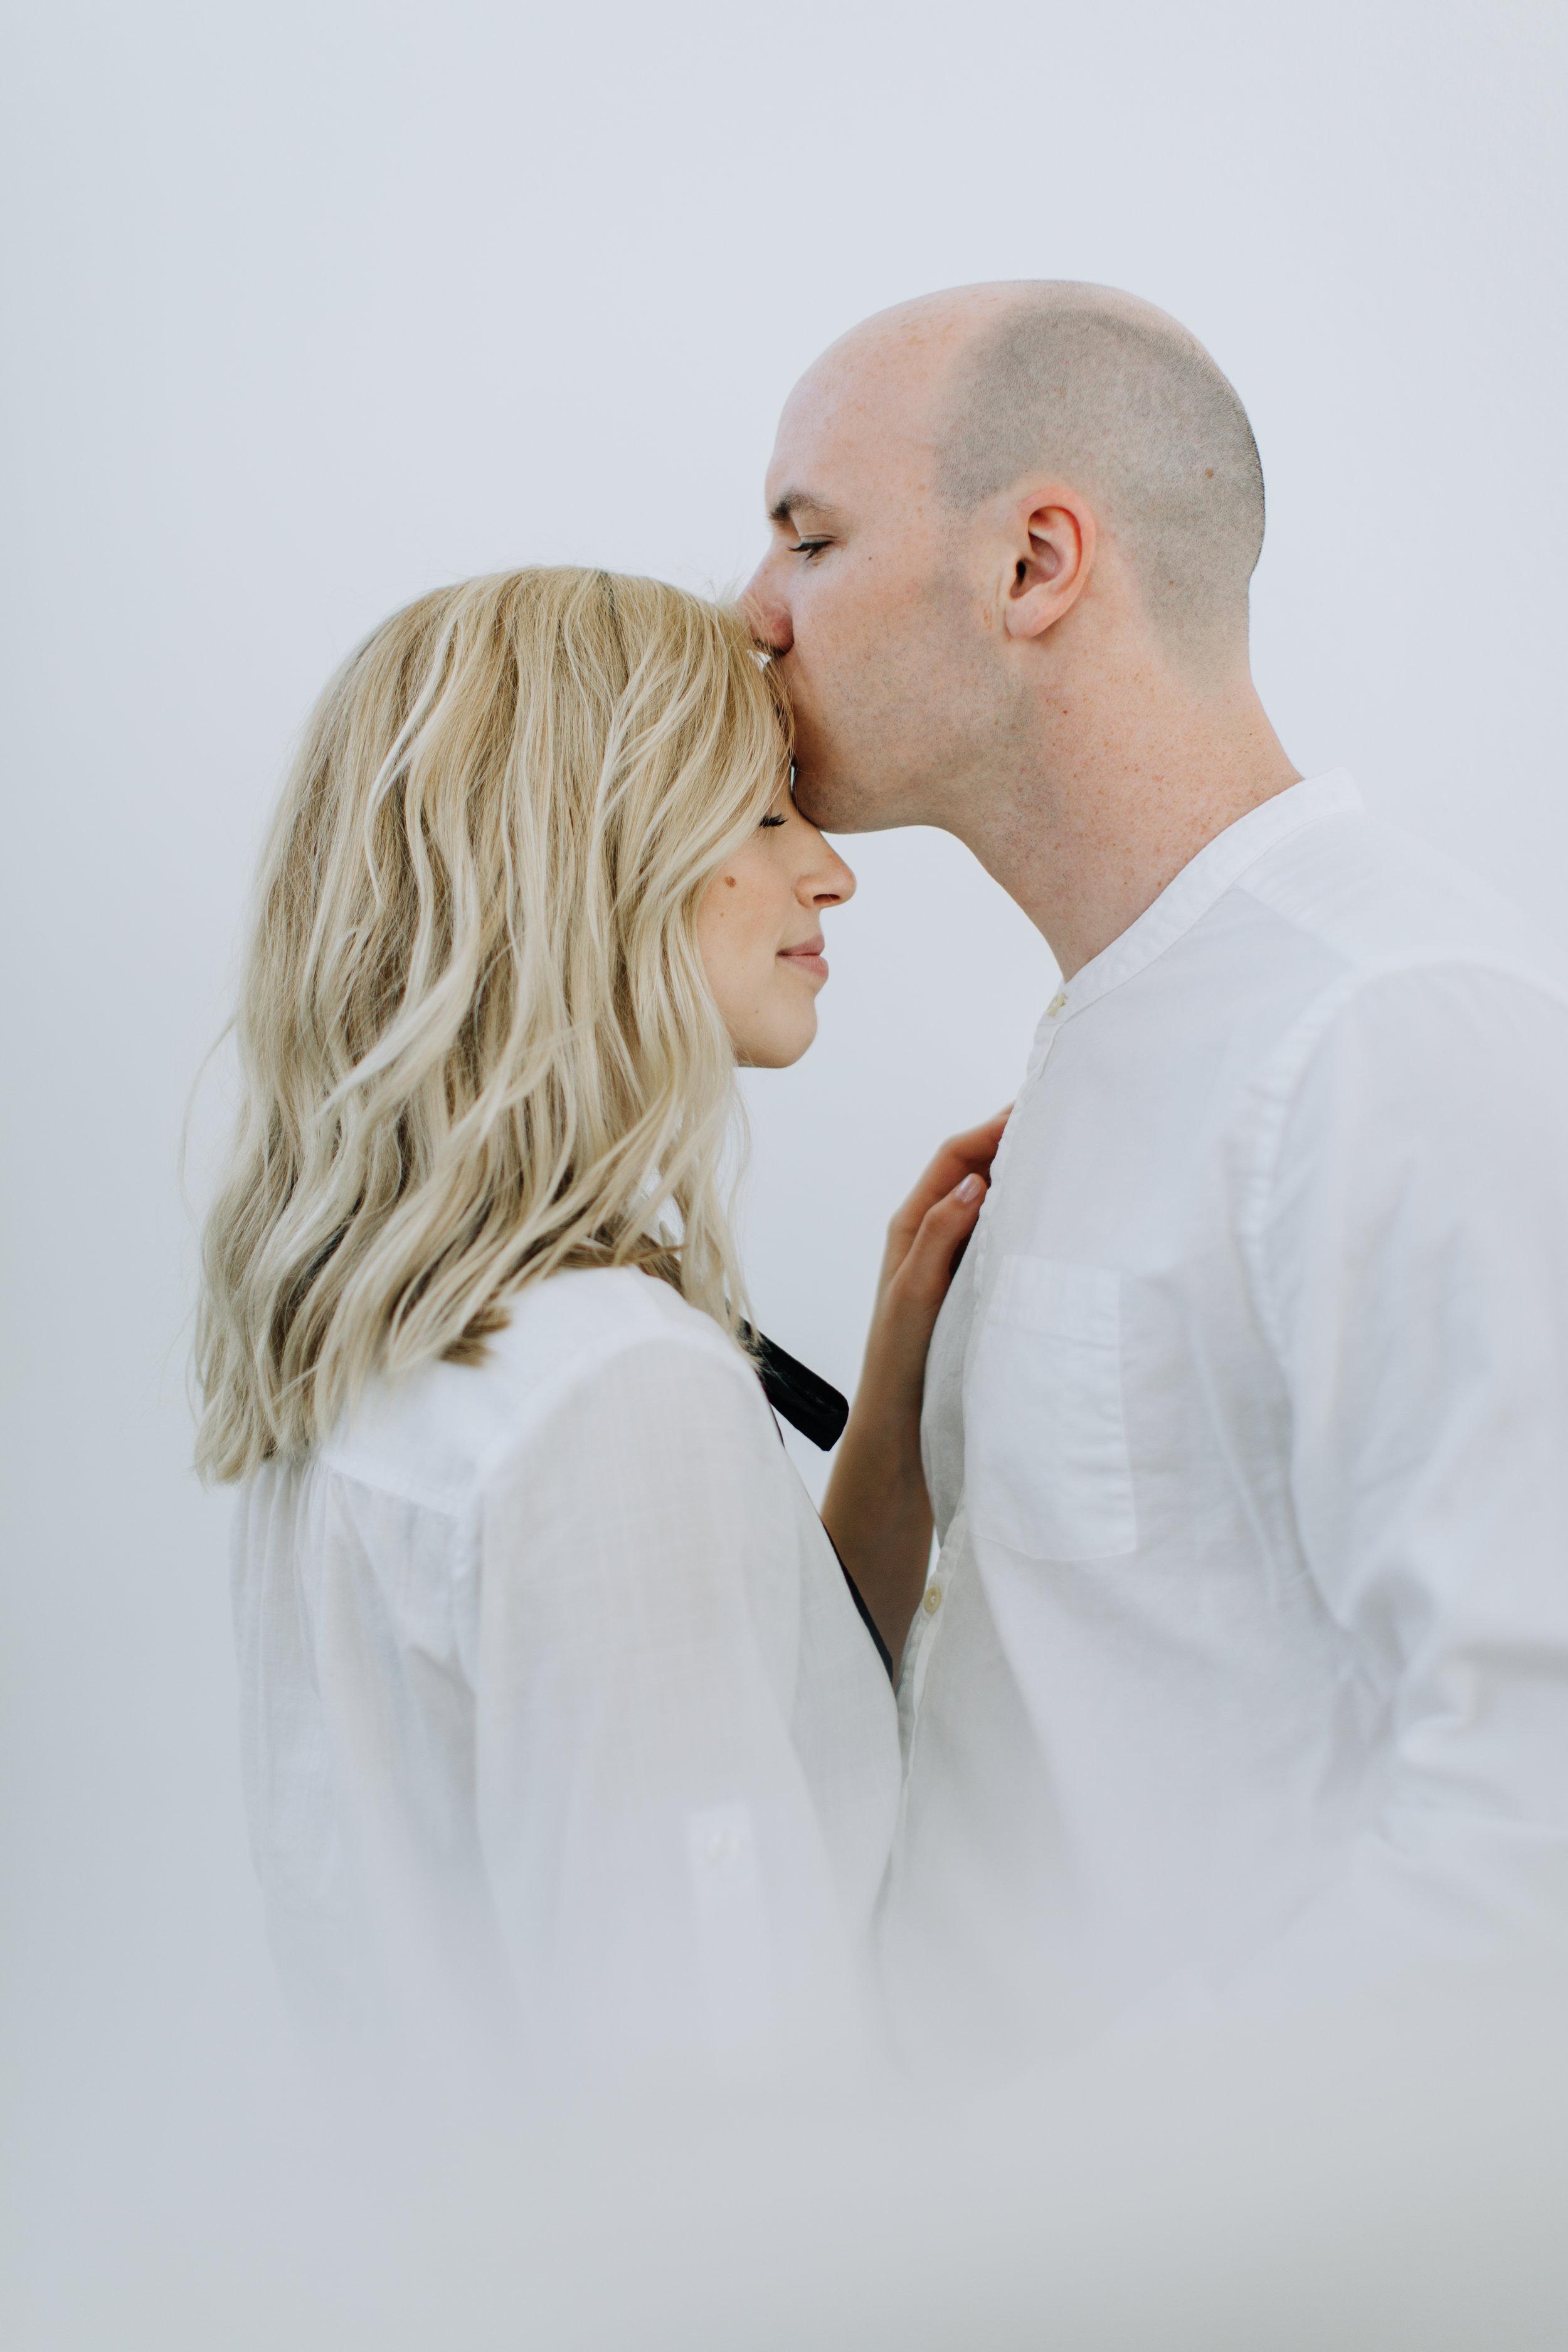 Paige-Newton-Photography-Engagement-Shoot.jpg